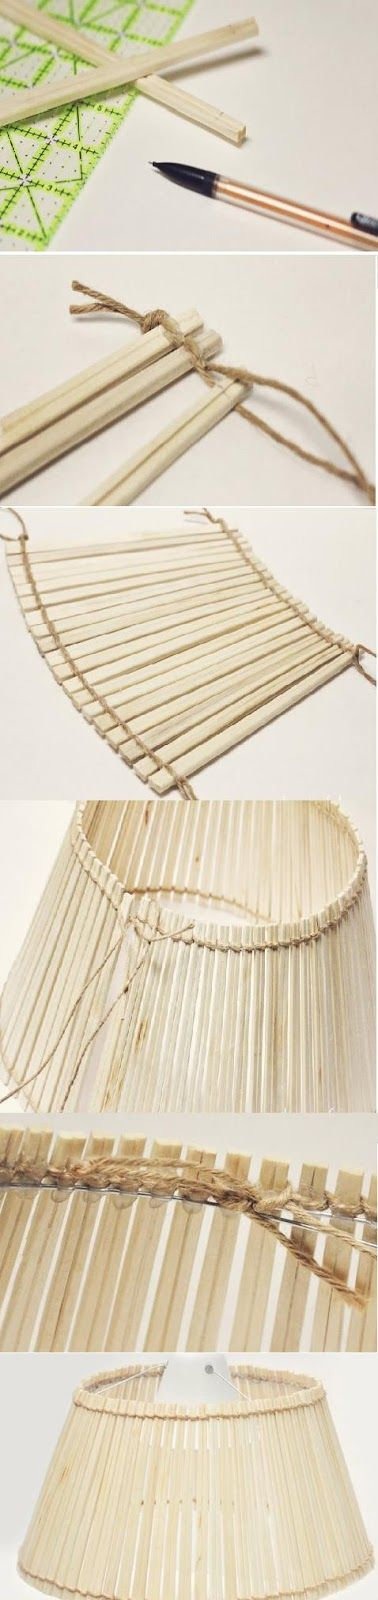 Chopstick lampshade tutorial | diy craft TUTORIALS